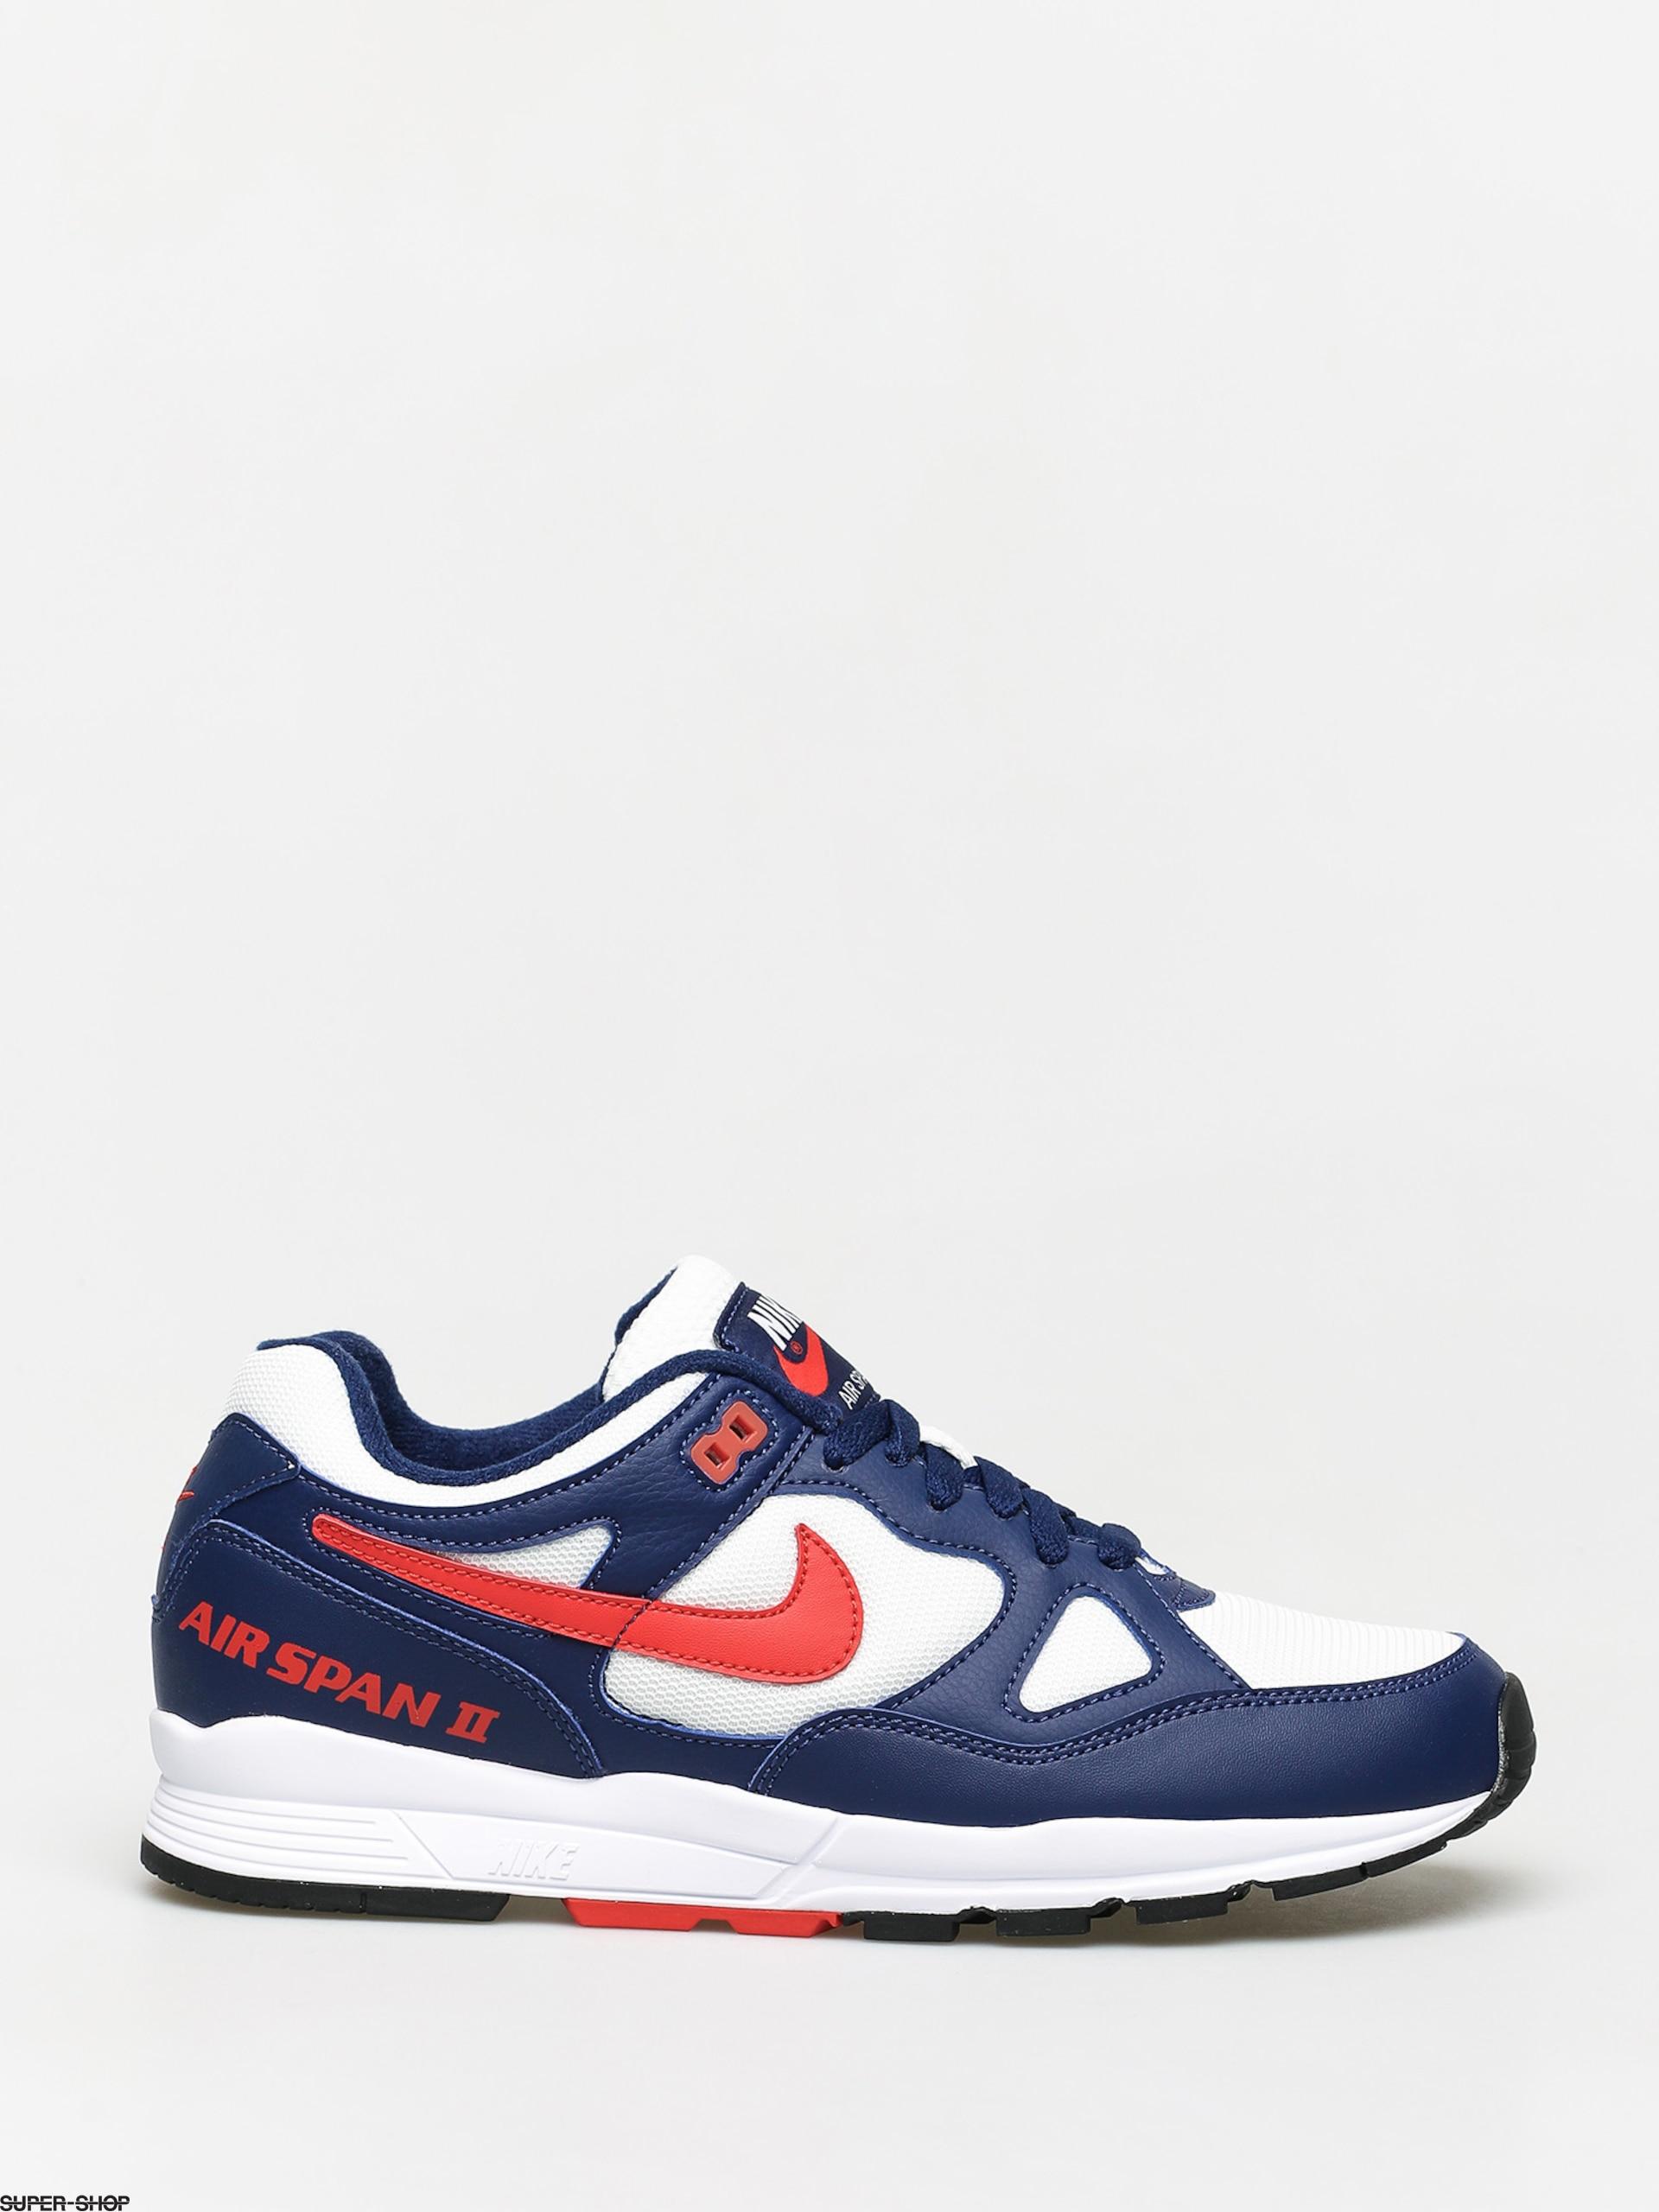 Alas ballet Rebobinar  Nike Air Span II Shoes (blue void/habanero red white black)